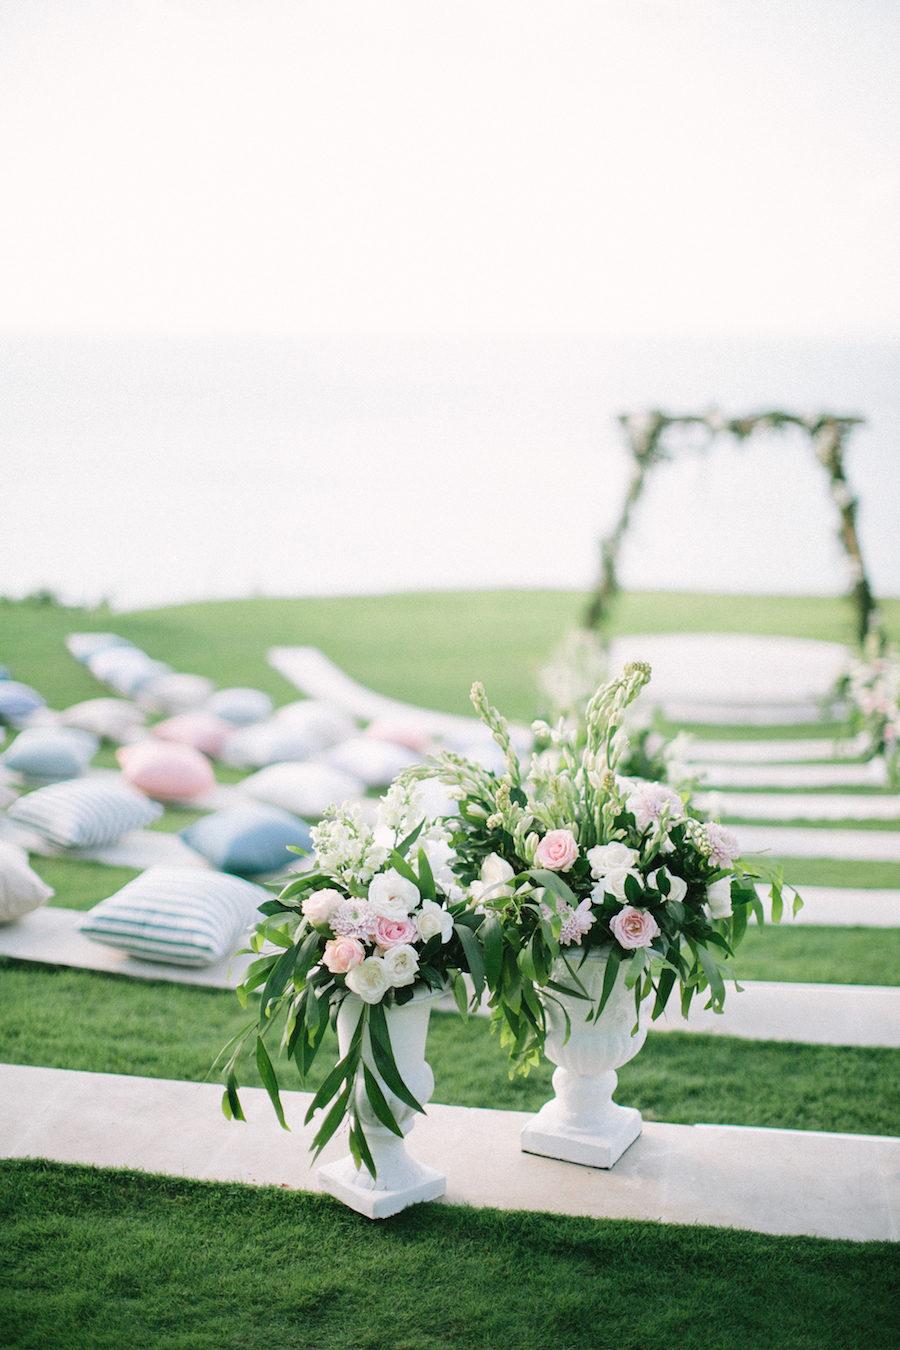 Elegant French Wedding in Bali